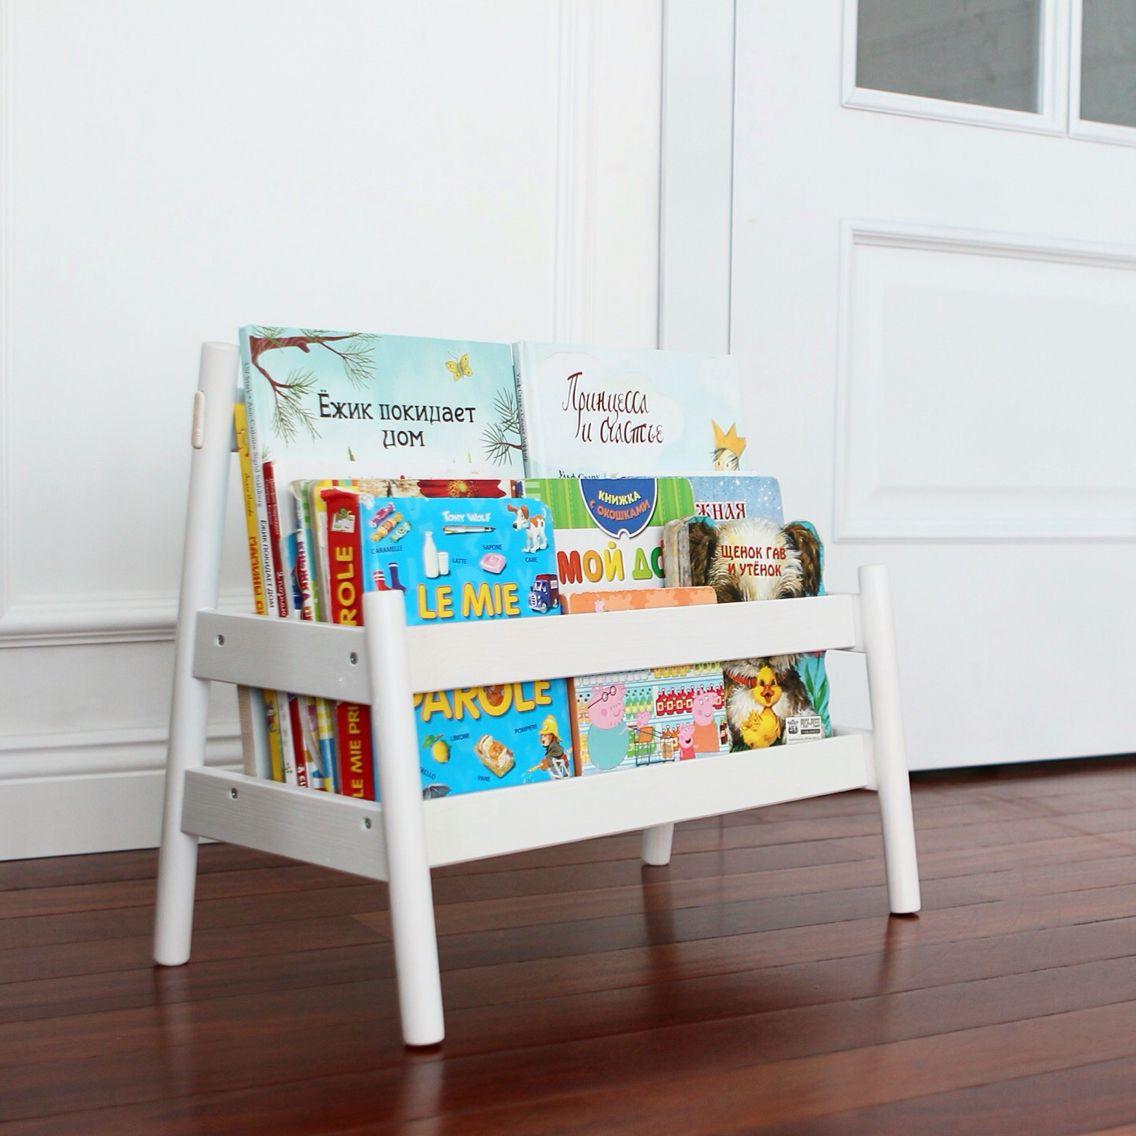 Ikea Flisat Bookstorage Makeover Ikea Flisat Kidsroom